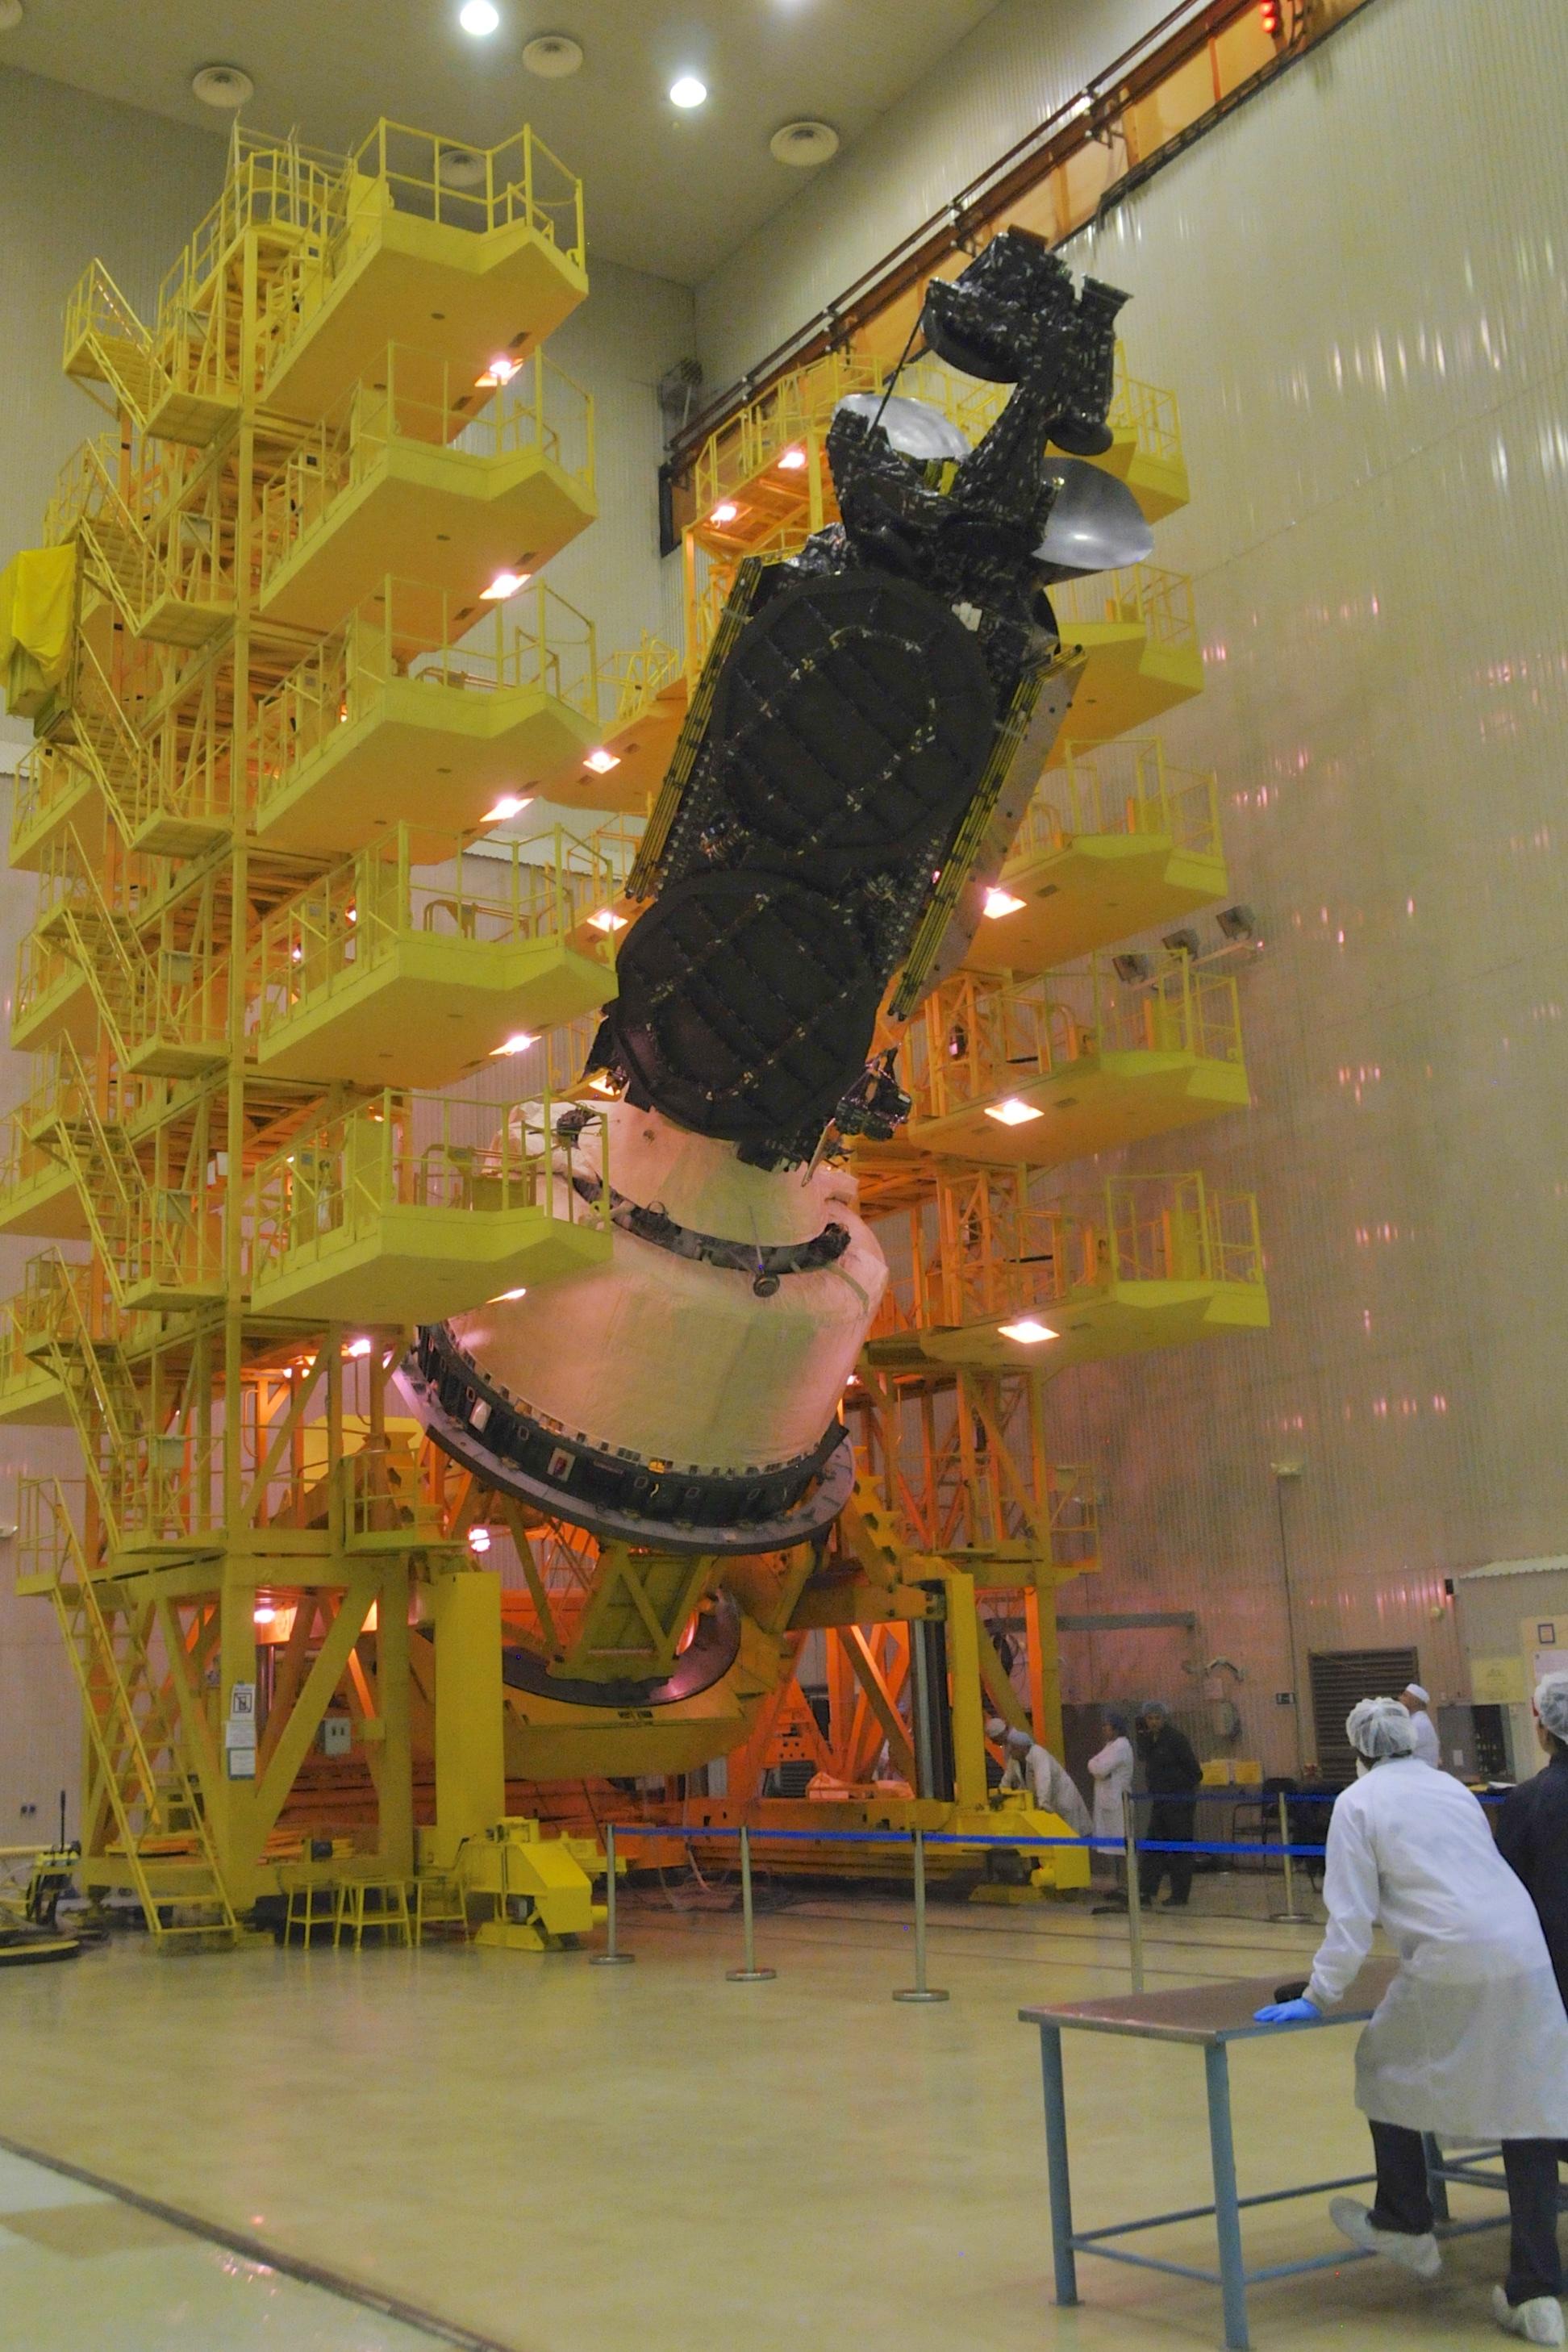 Lancement Proton-M / Intelsat-31 - 9 juin 2016 ISDLA-2-28-May-6